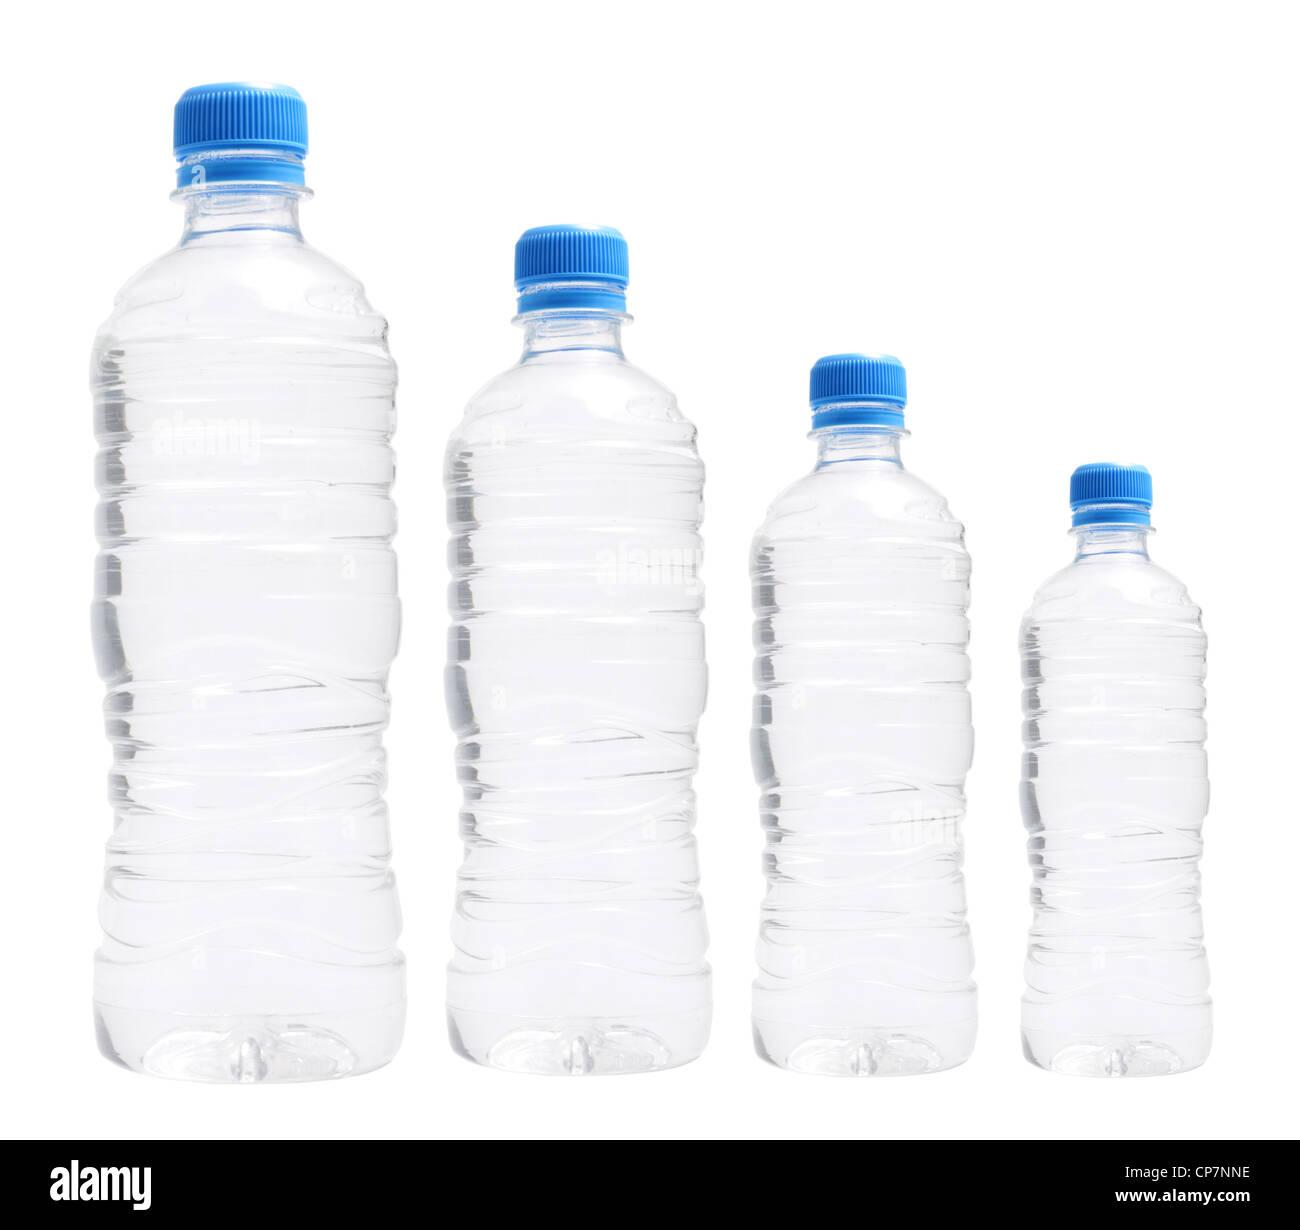 Bottles of Water - Stock Image